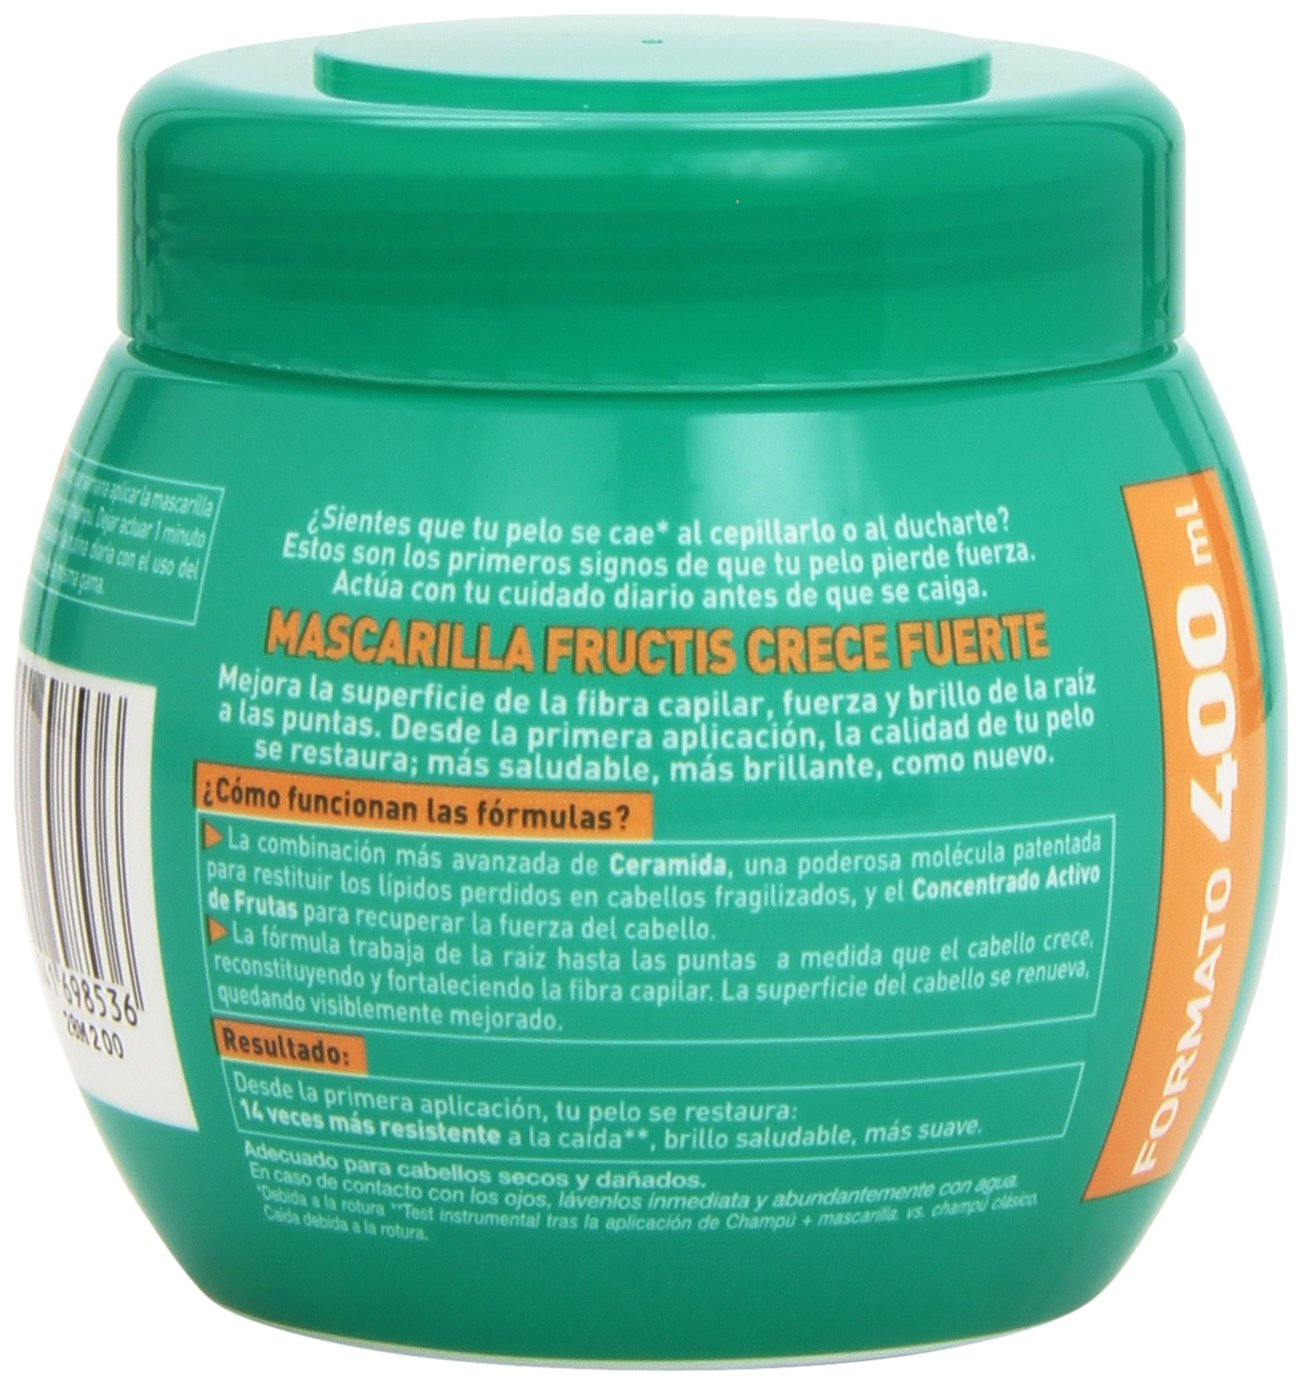 Garnier Fructis Crece Fuerte Mascarilla - 400 ml: Amazon.es: Amazon Pantry